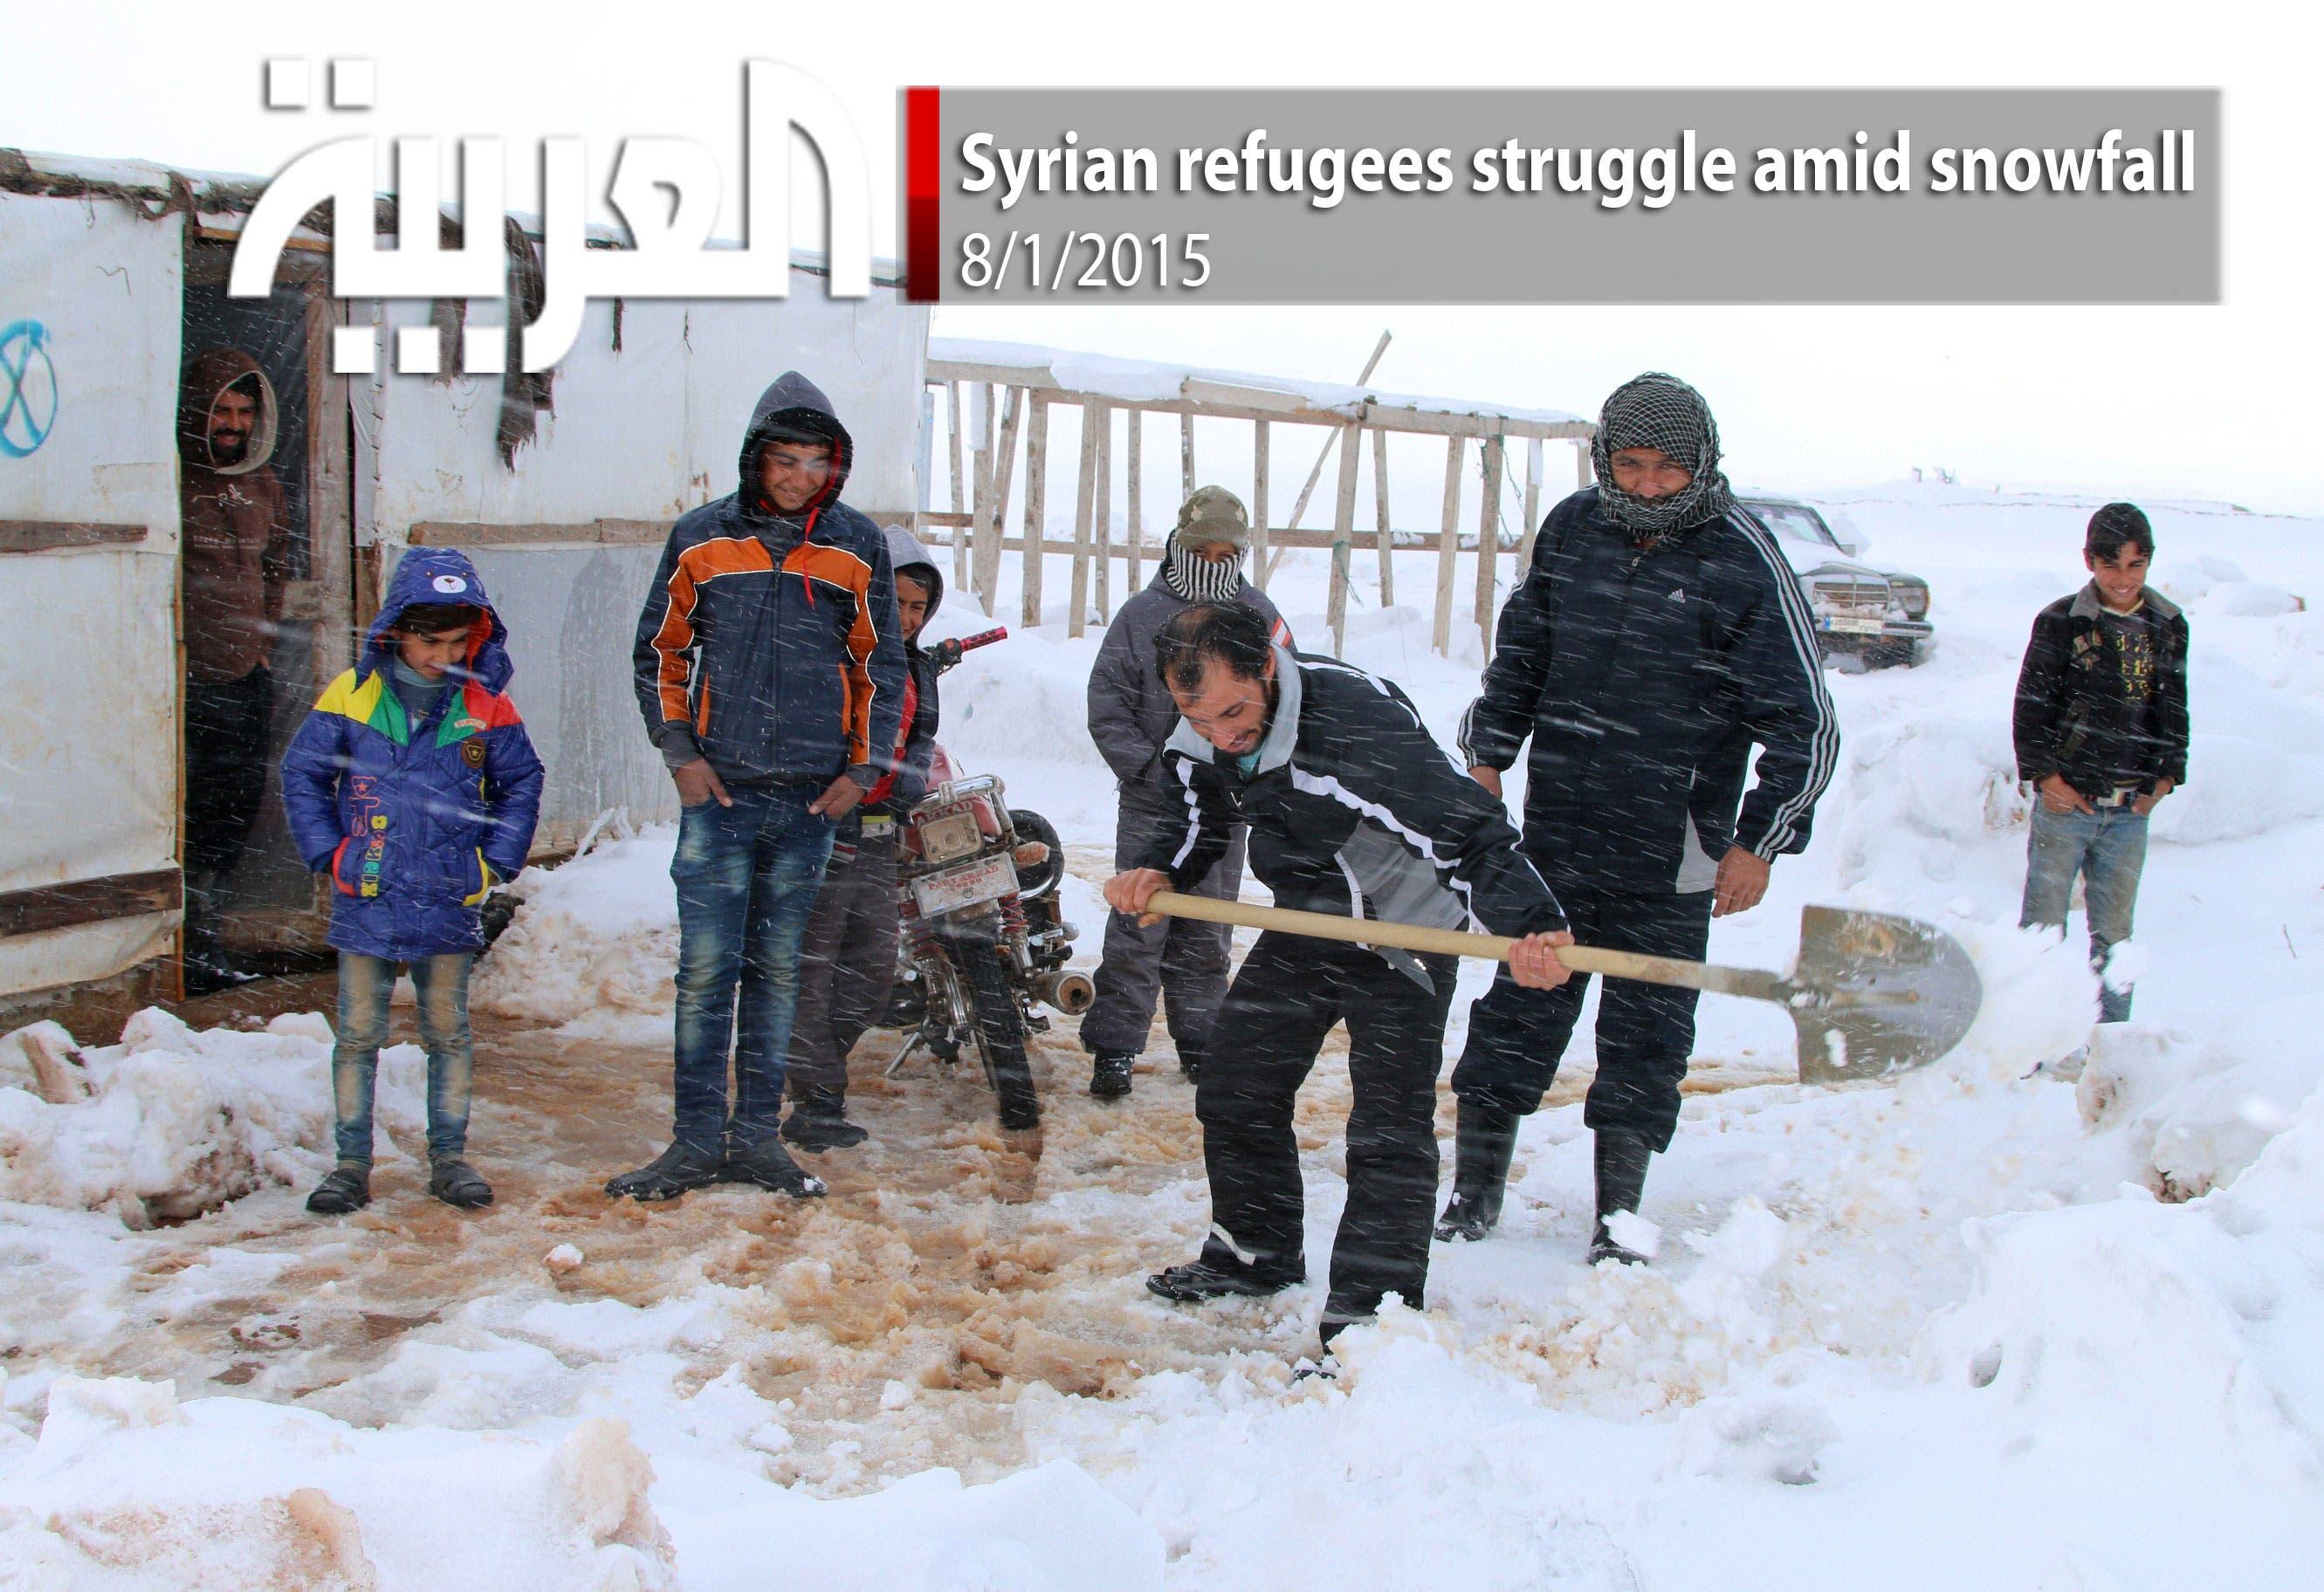 Syrian refugees struggle amid snowfall